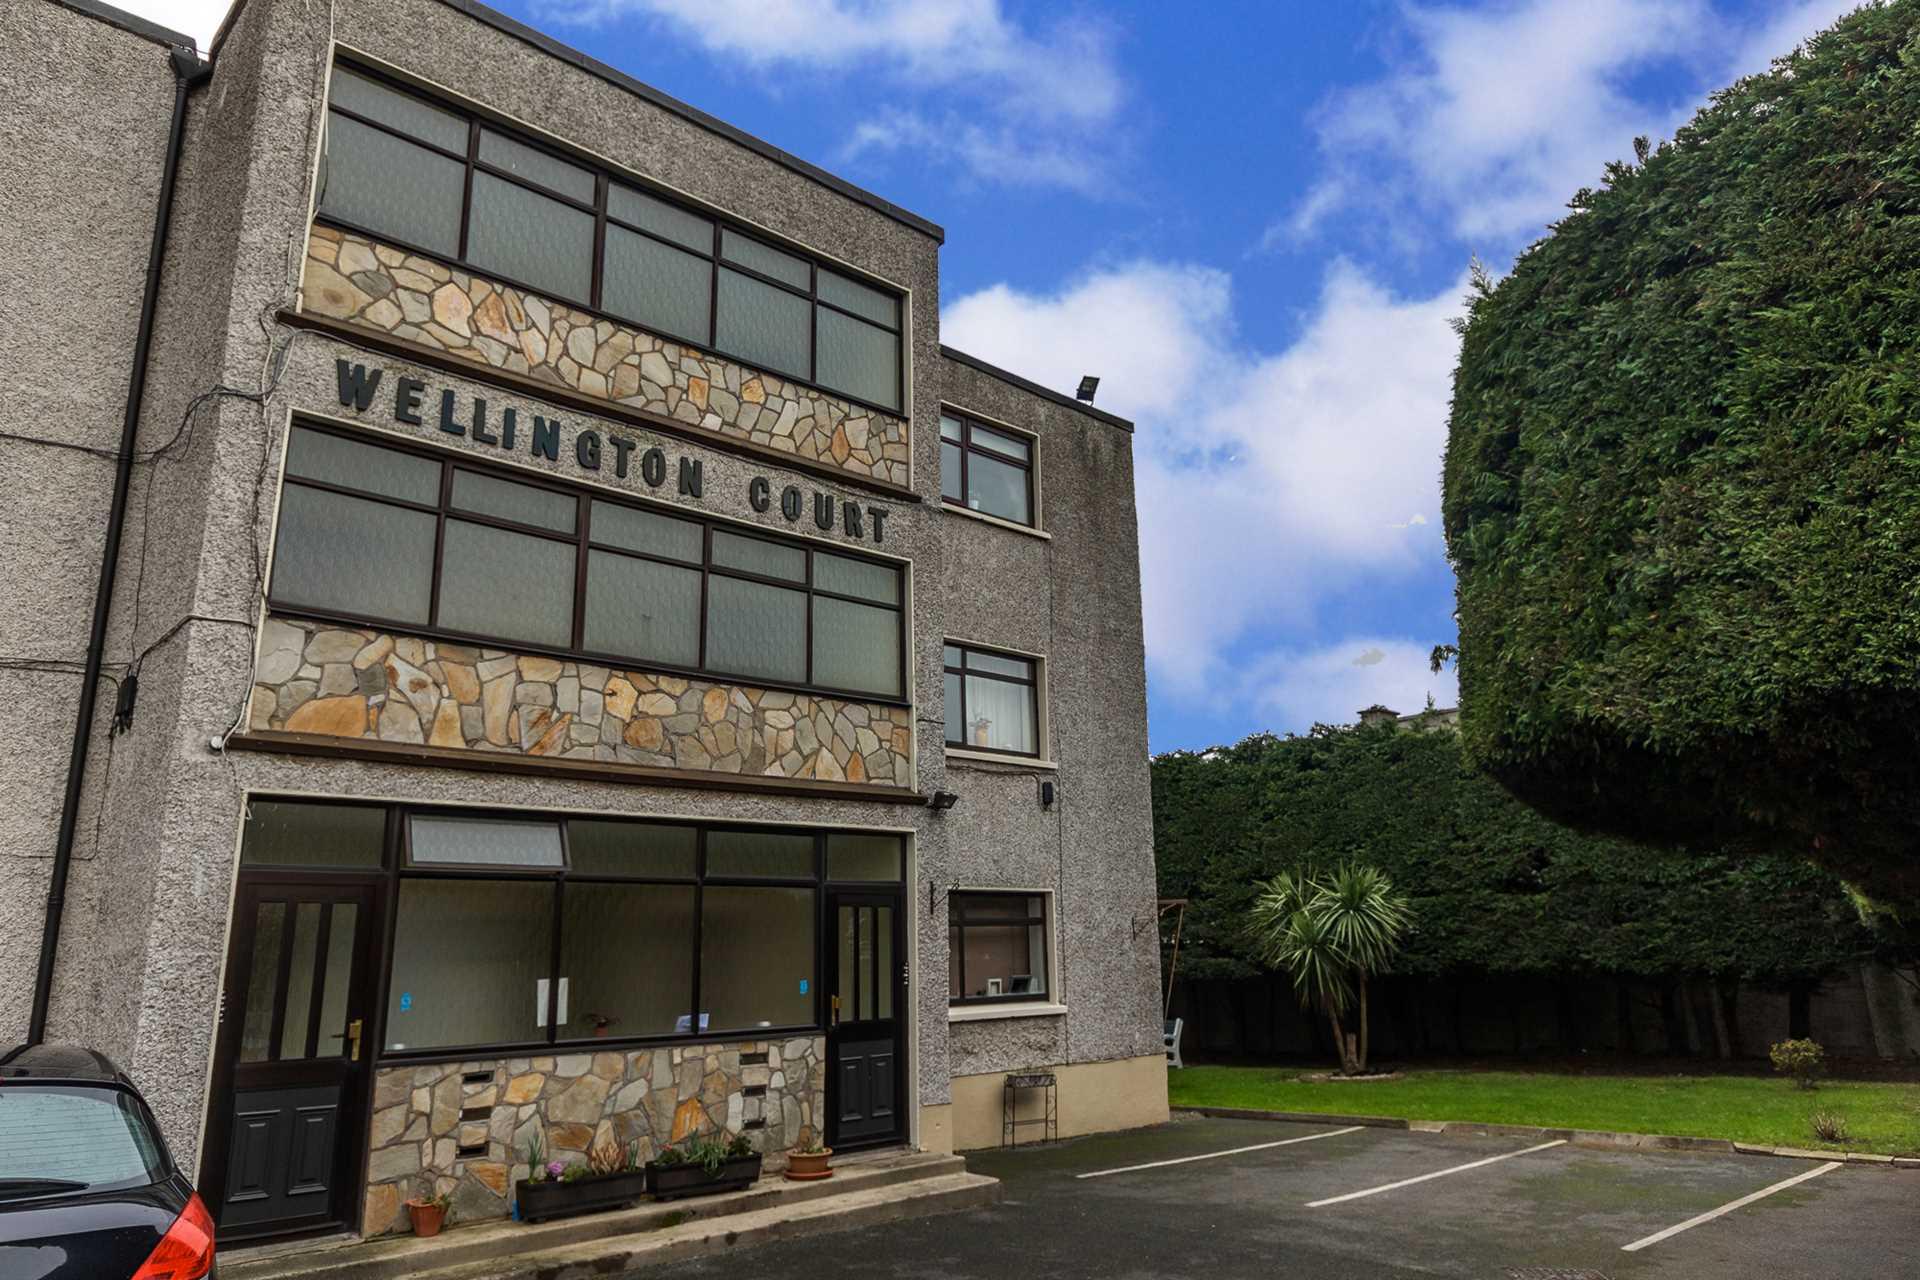 1 Wellington Court, Perrystown, Dublin 12, Image 1